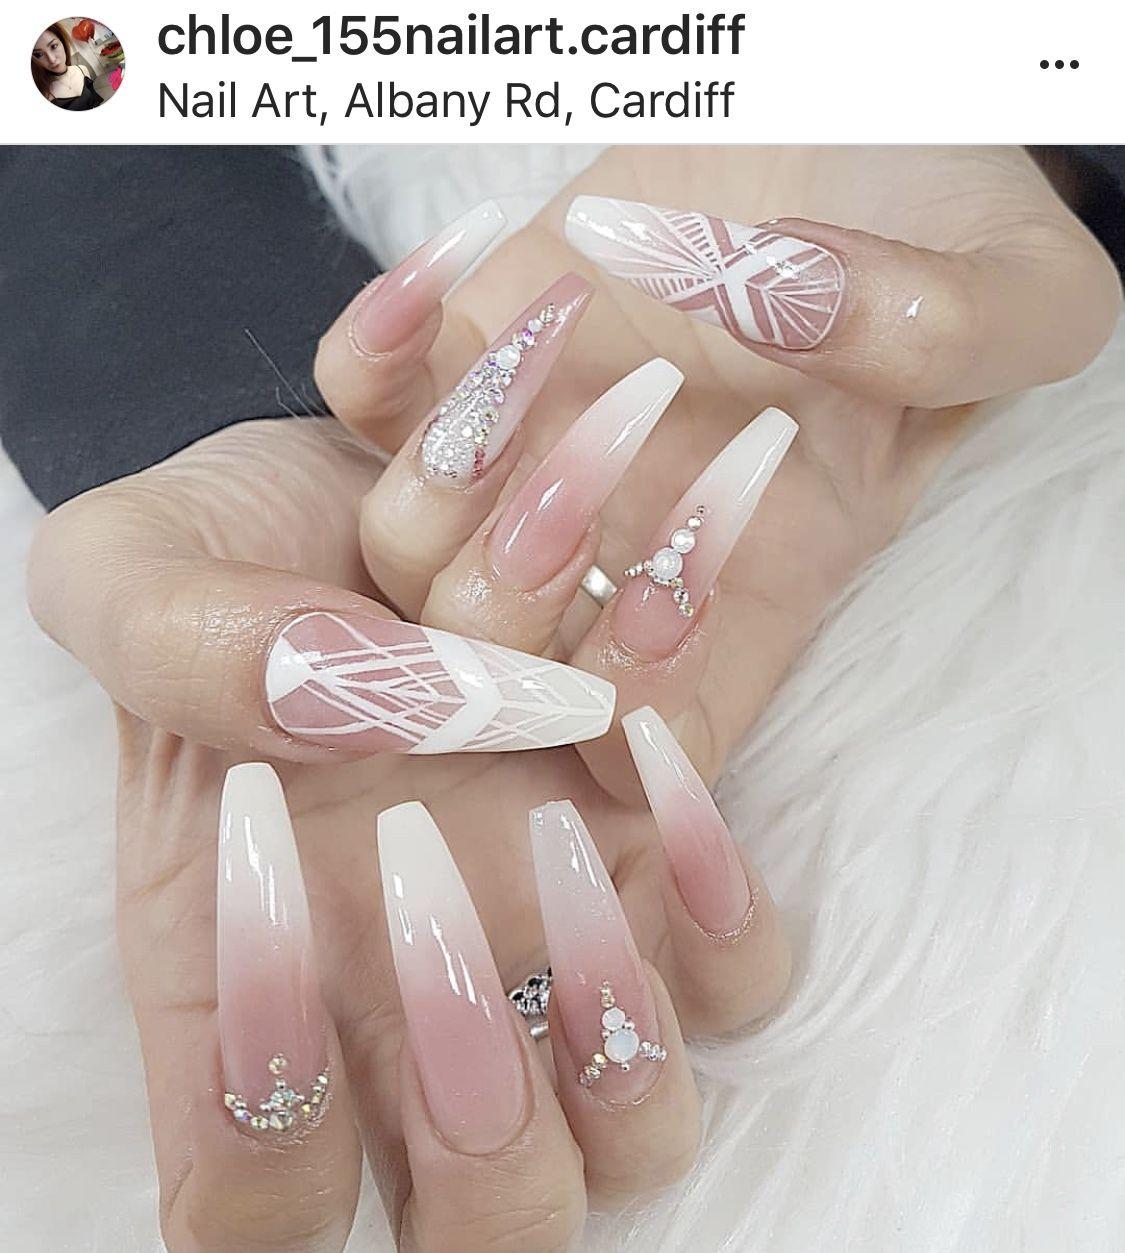 Pin By Shana Endley On Nails Pinterest